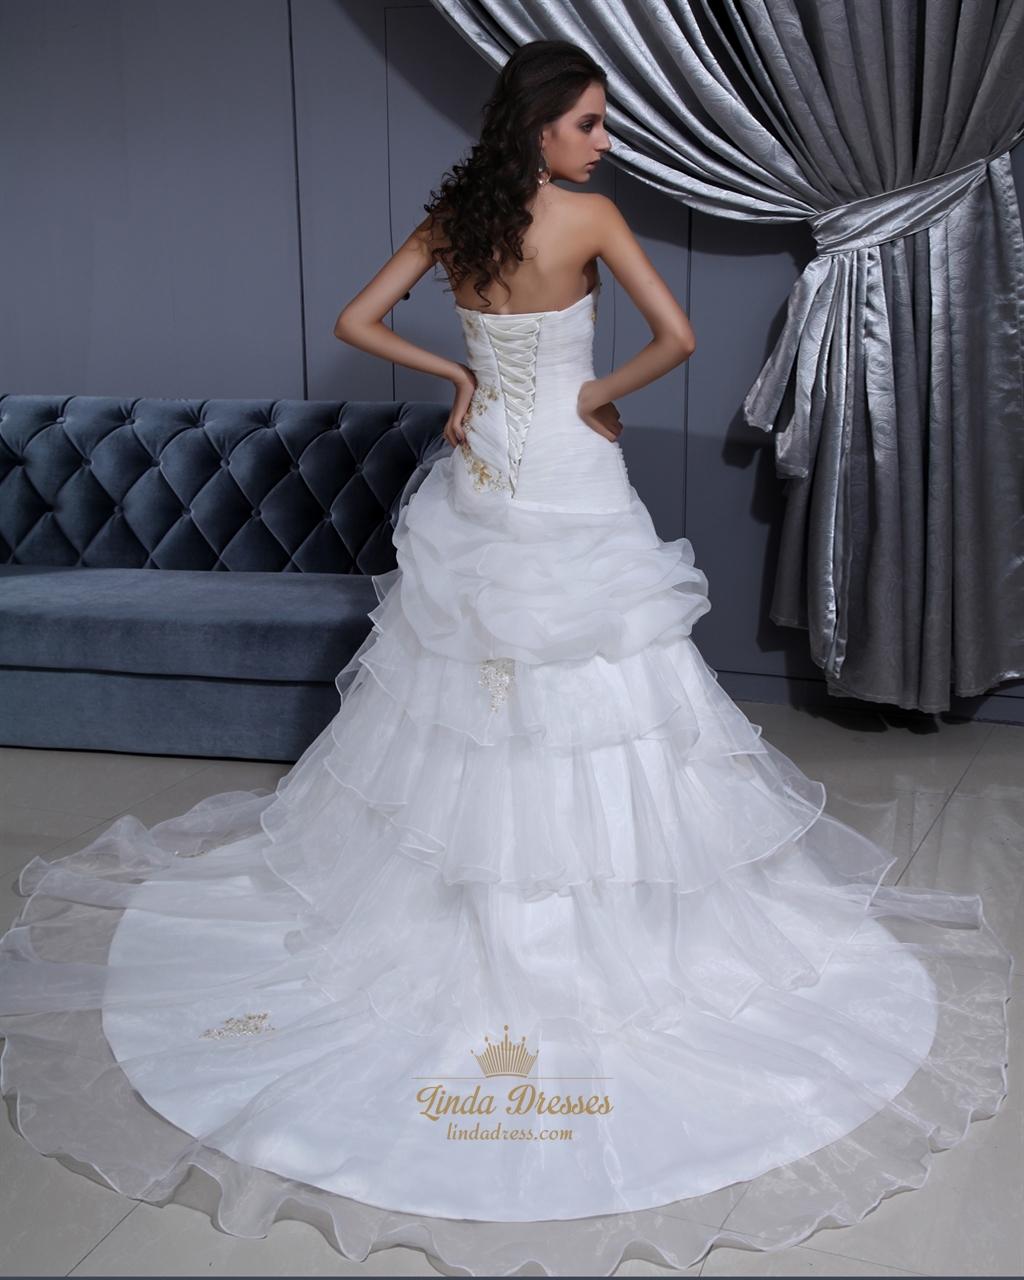 White Strapless Organza Layered Skirt Wedding Dress With